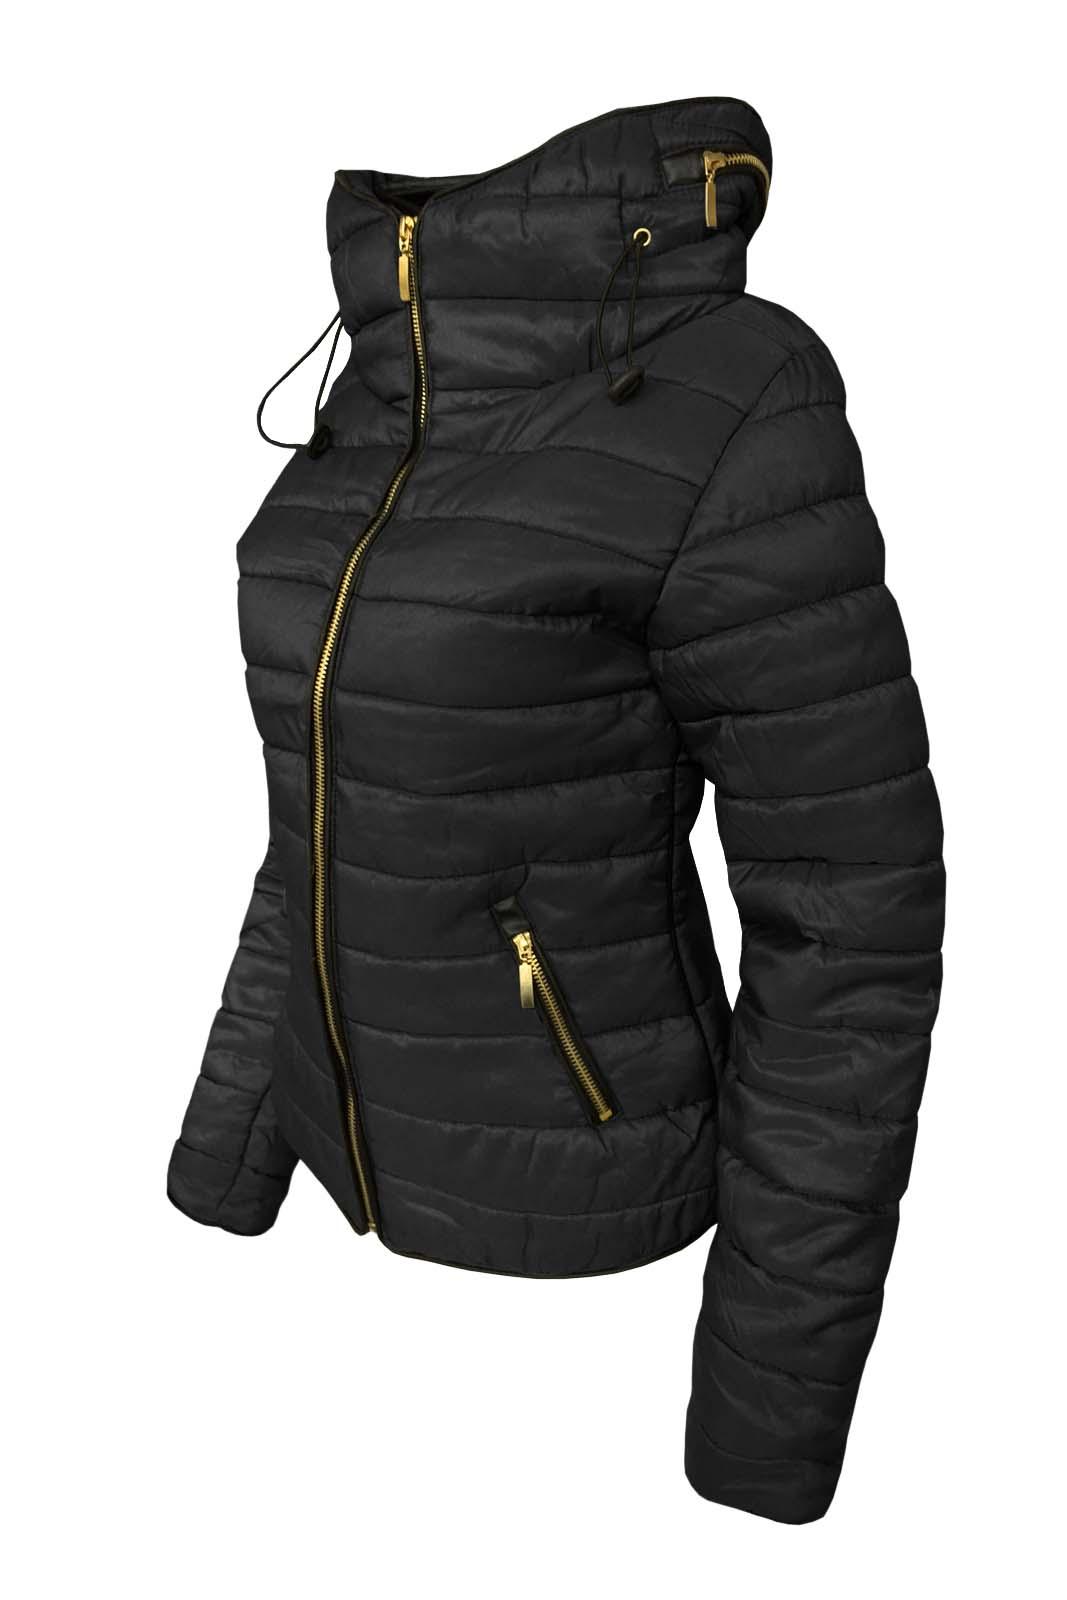 Womens padded jackets